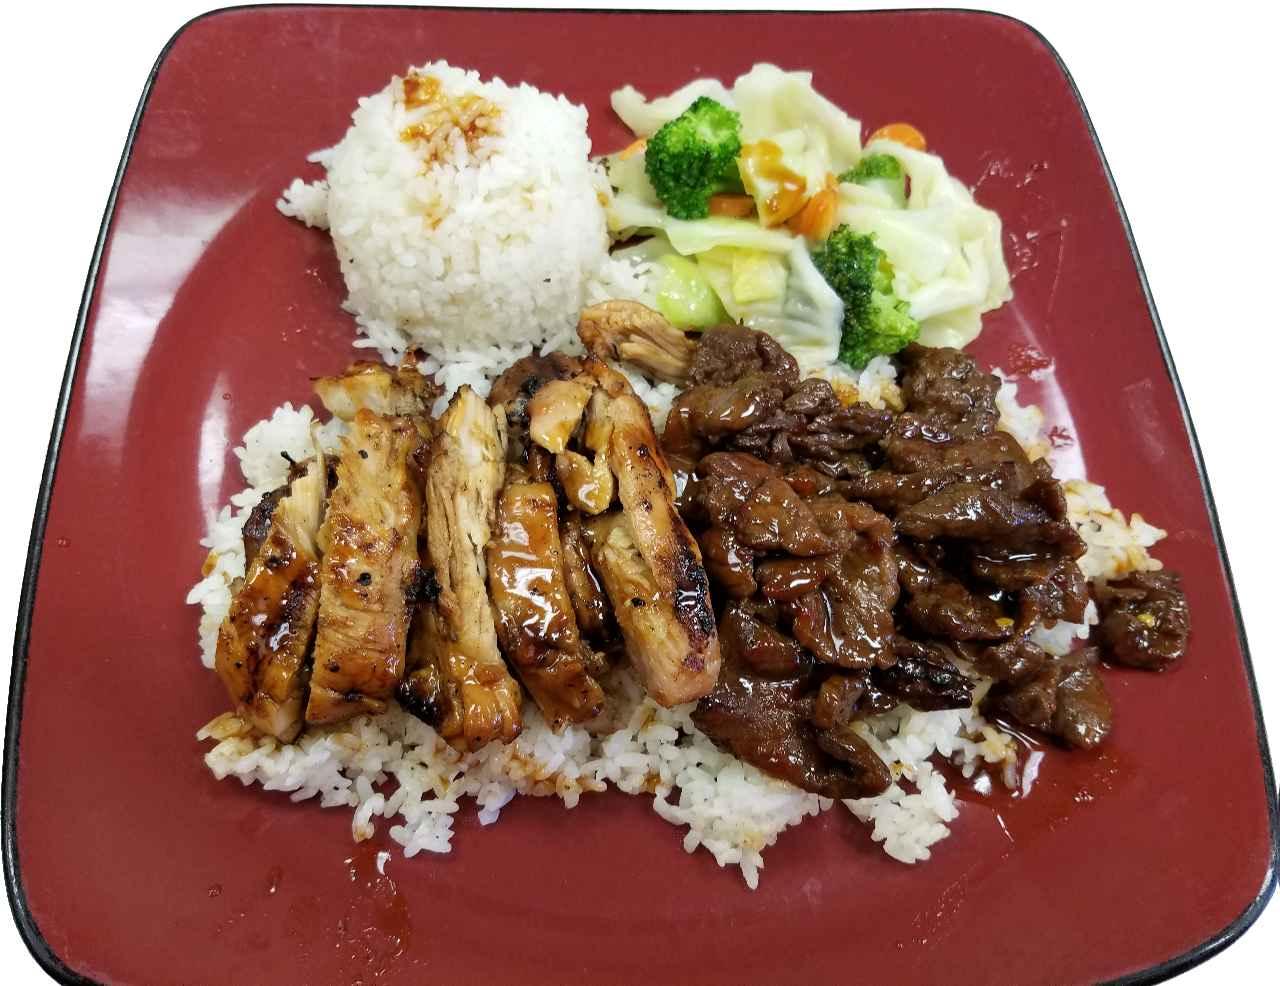 11. Teriyaki Chicken with Beef or Pork